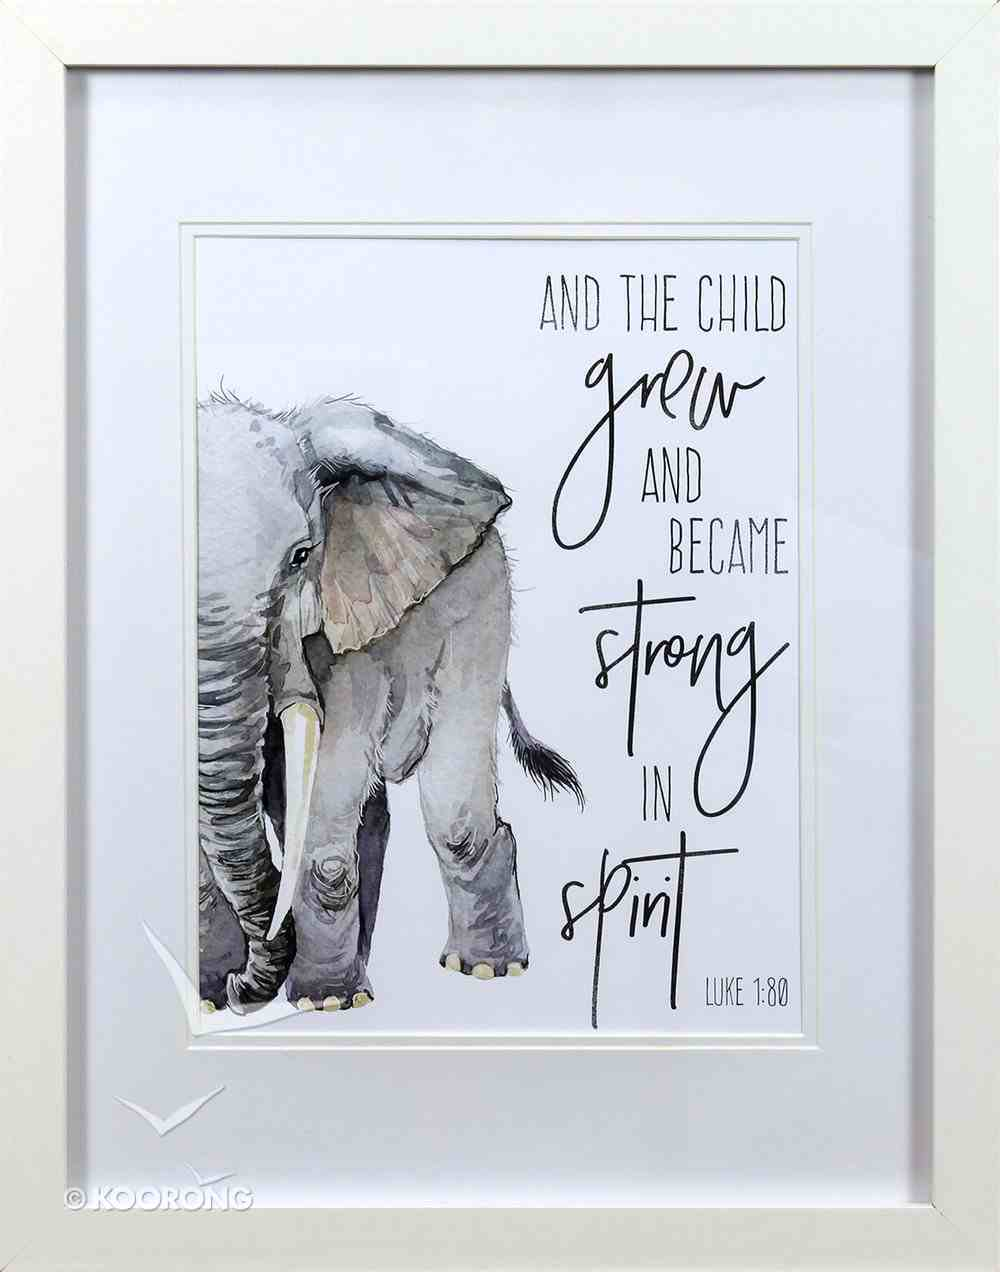 Framed Children's Print Watercolour Elephant and the Child Grew (Luke 1: 80) Plaque